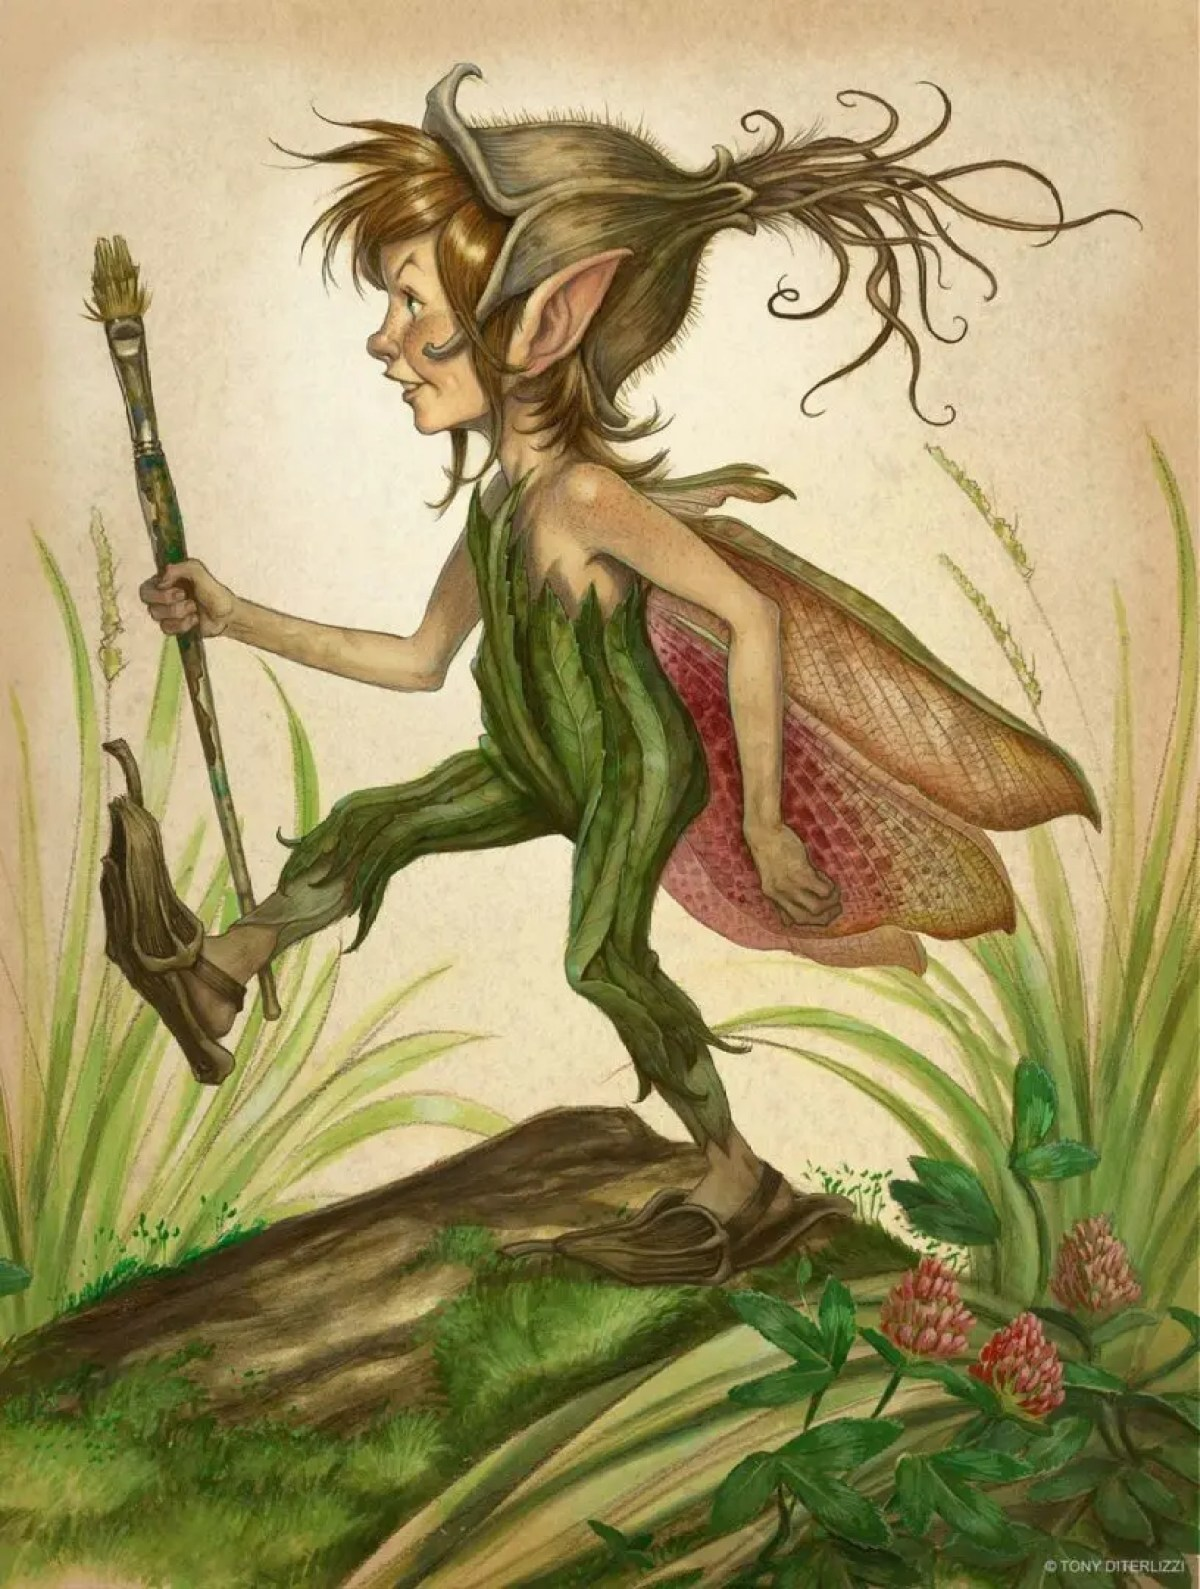 Ilustraciones: El Arte del Ilustrador Tony Di Terlizzi: Dibujo e Ilustración